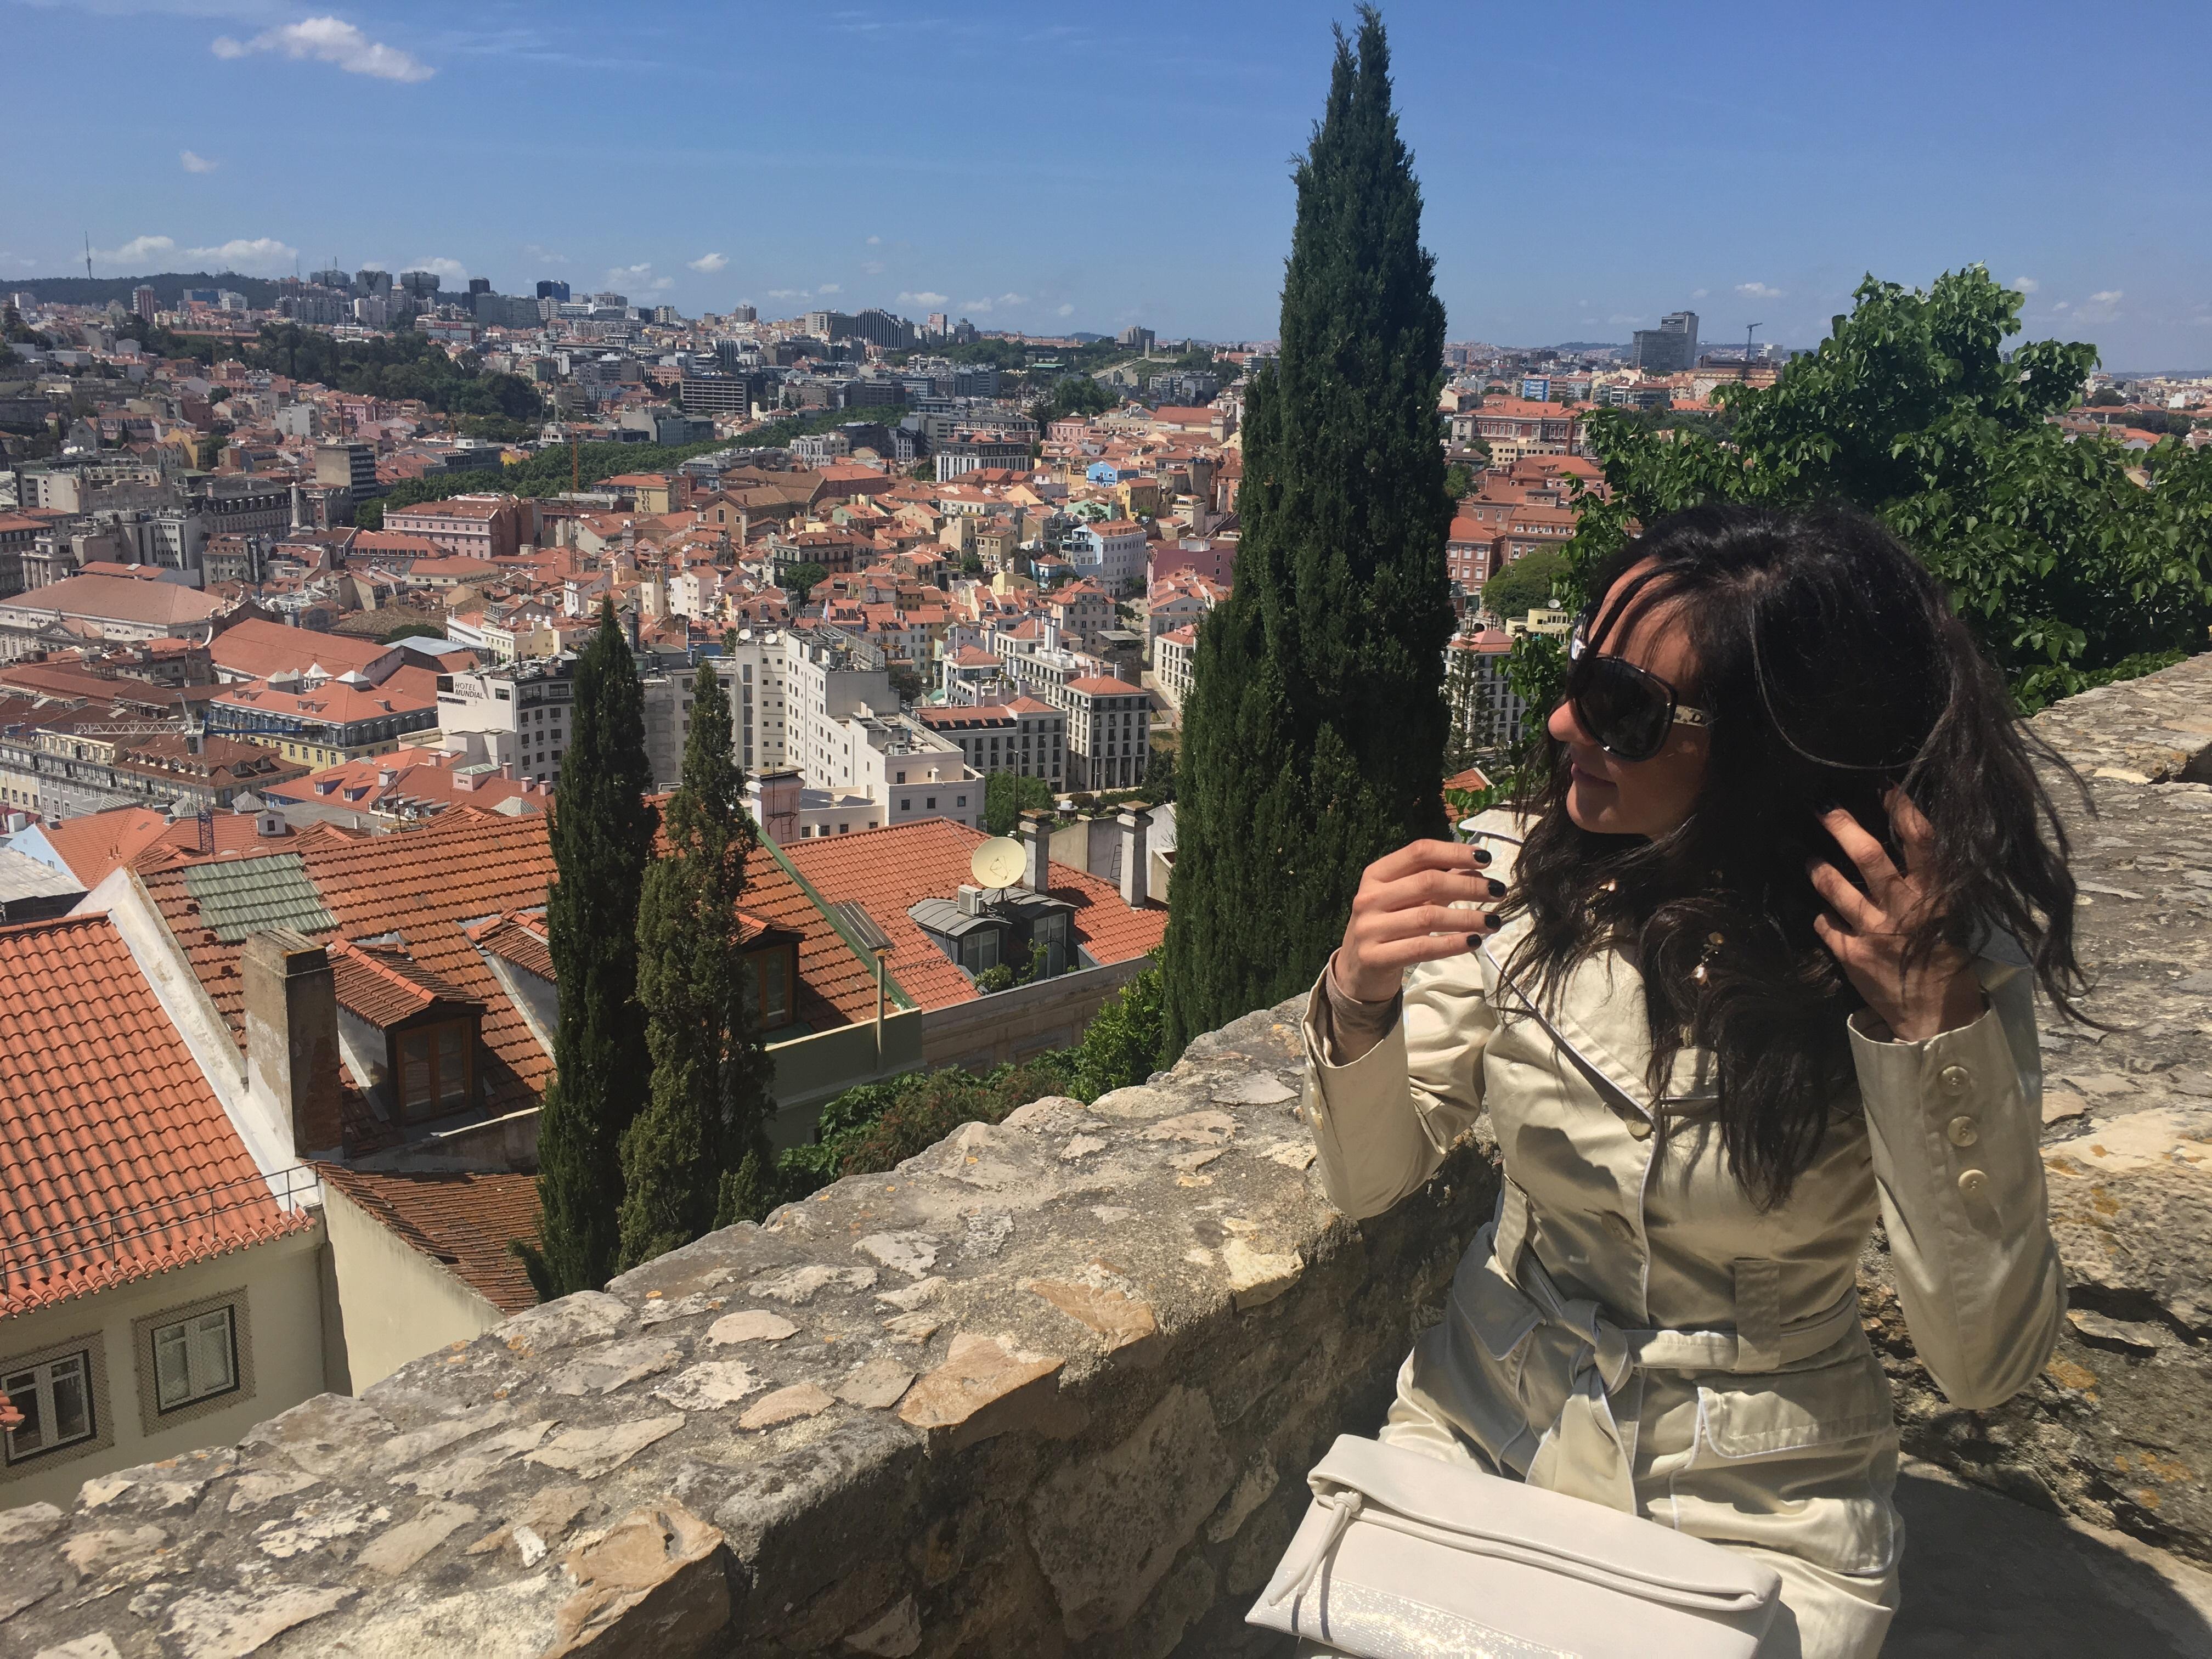 At Castelo de Sao Jorge | overlooking Lisbon